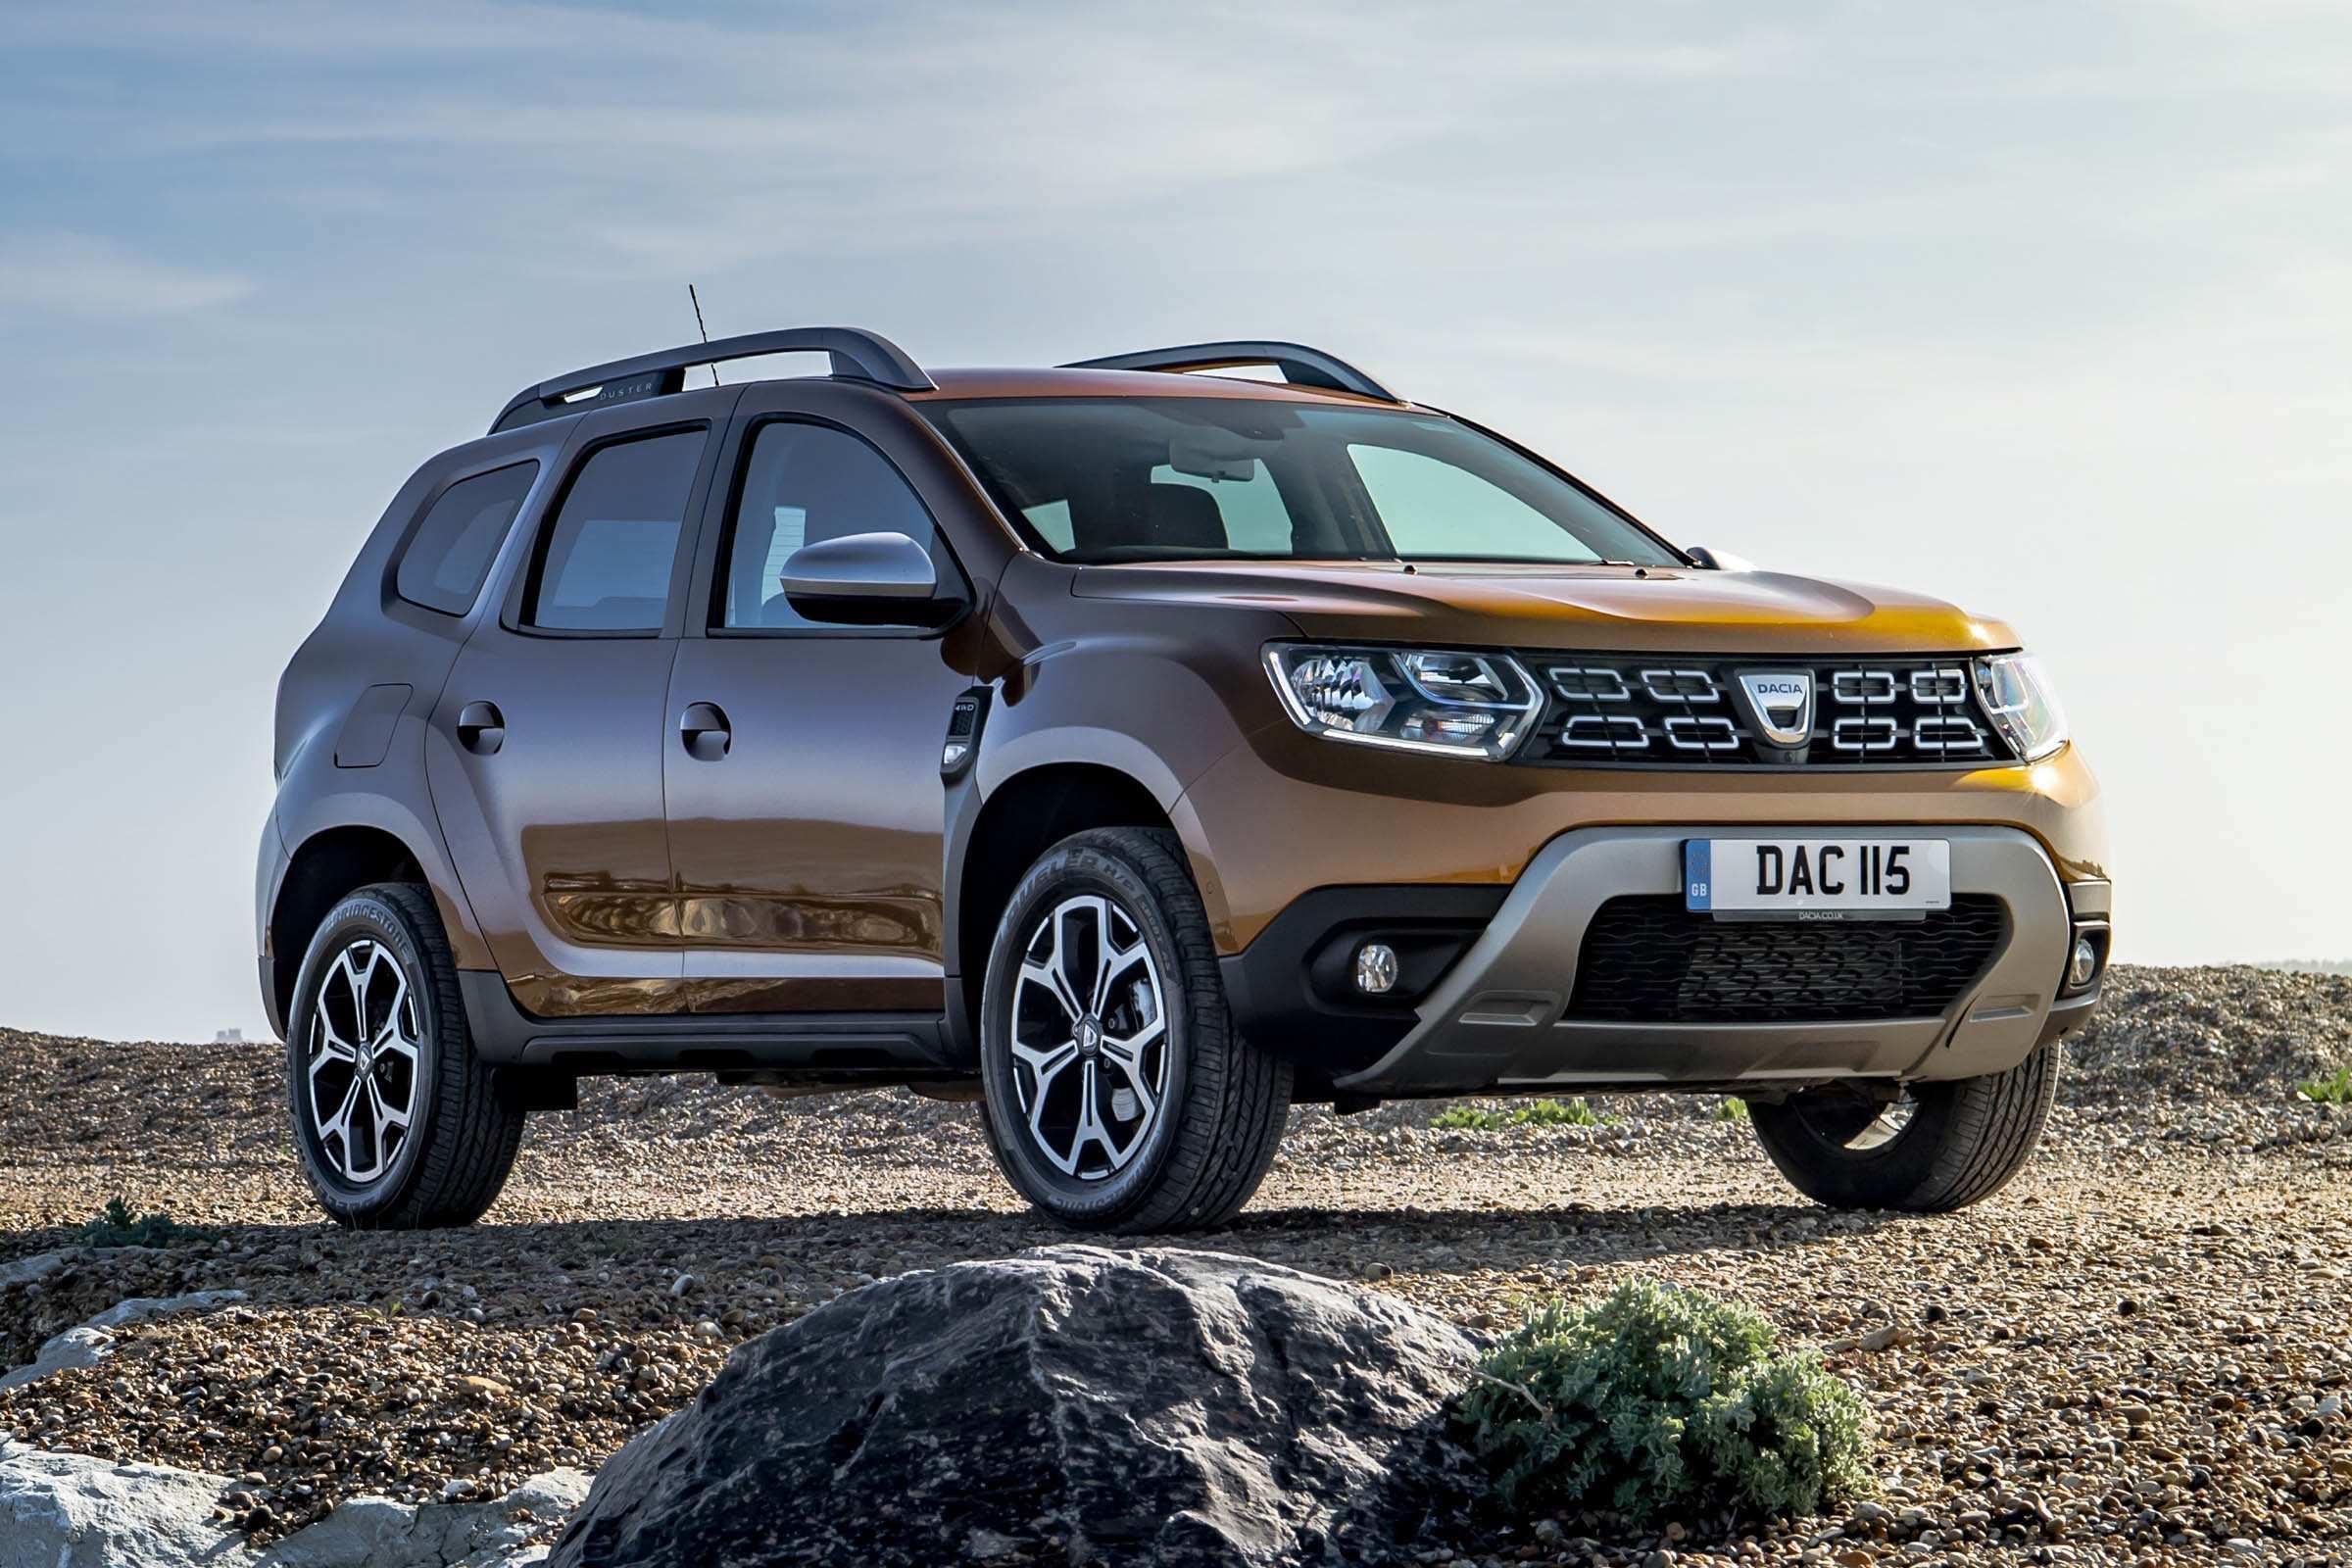 82 All New Dacia Duster 2019 Interior Rumors for Dacia Duster 2019 Interior